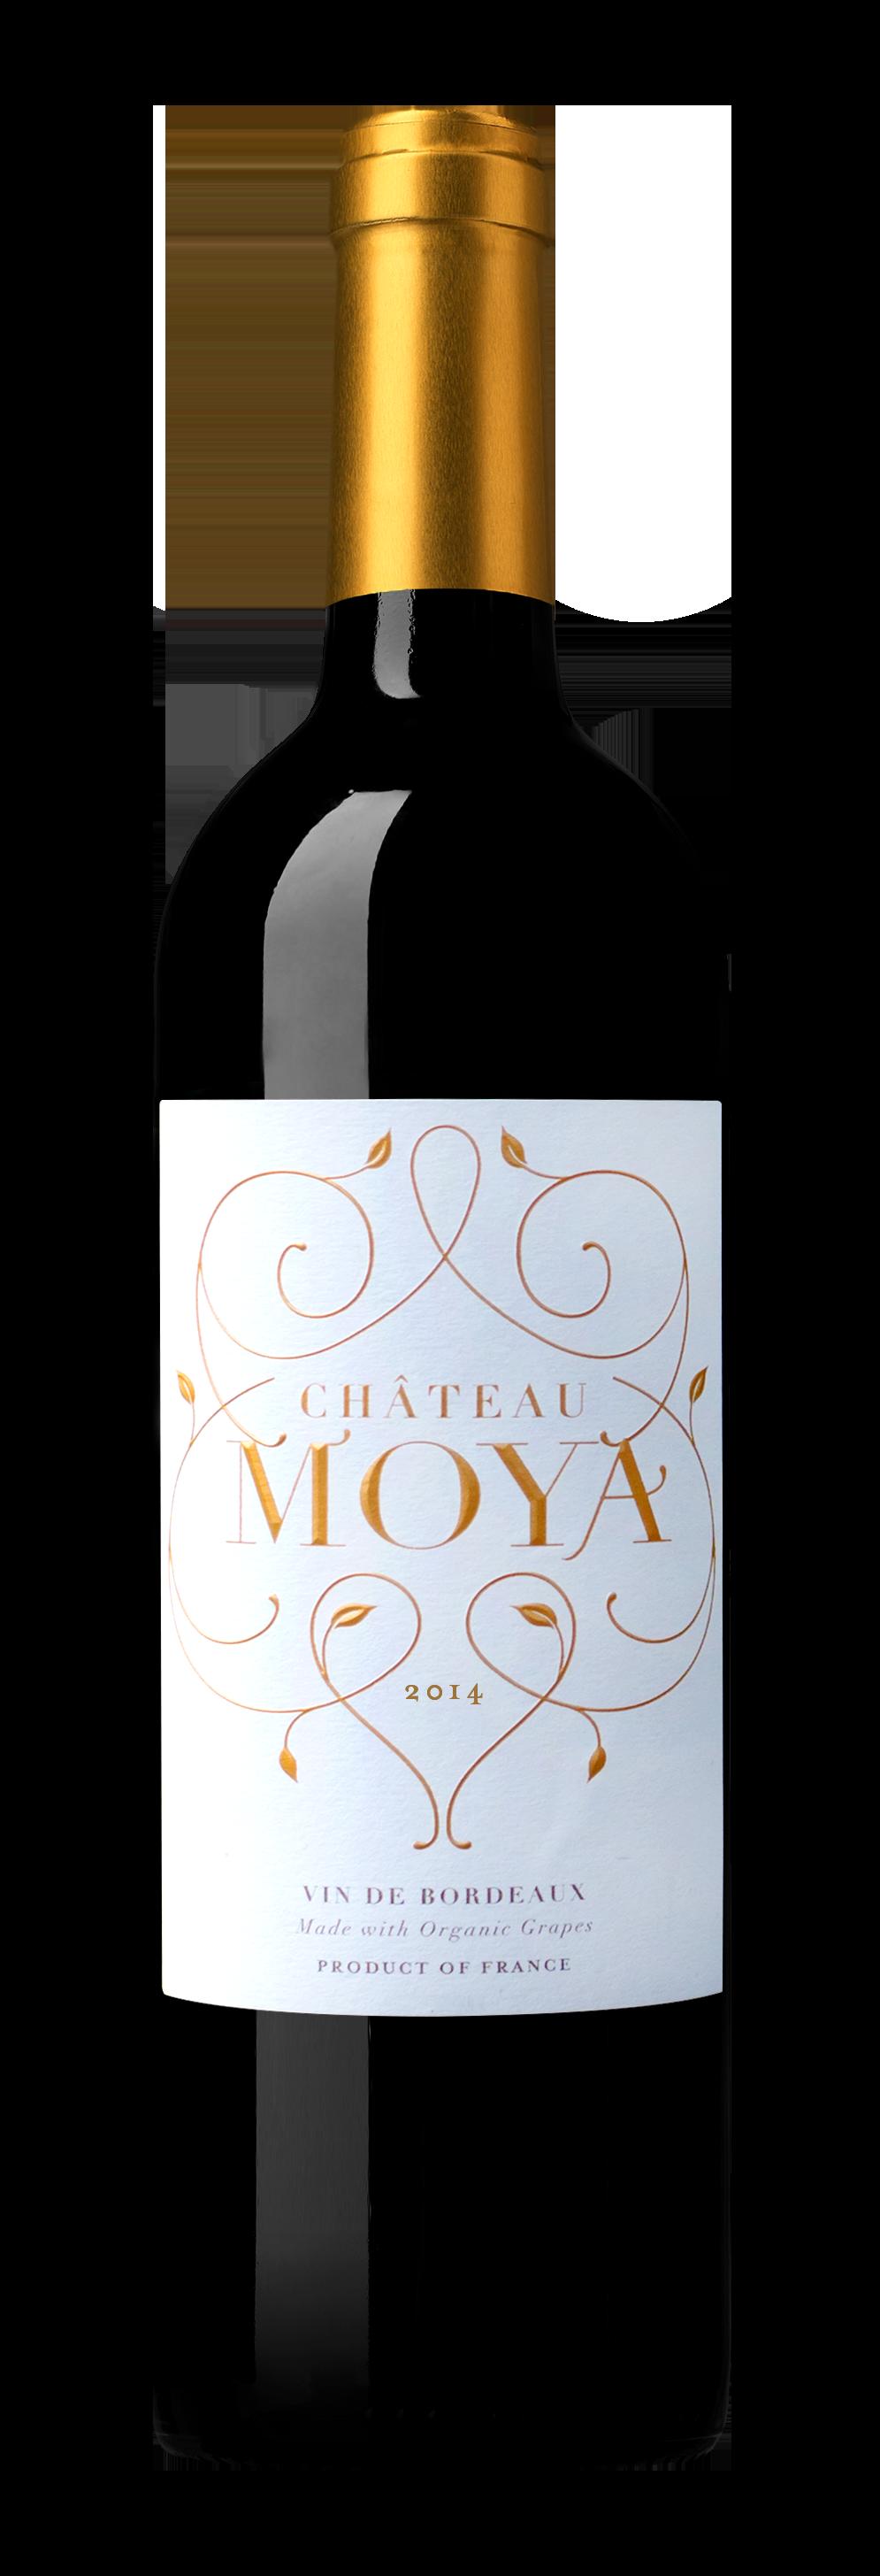 moya2014gold (1) (1).png